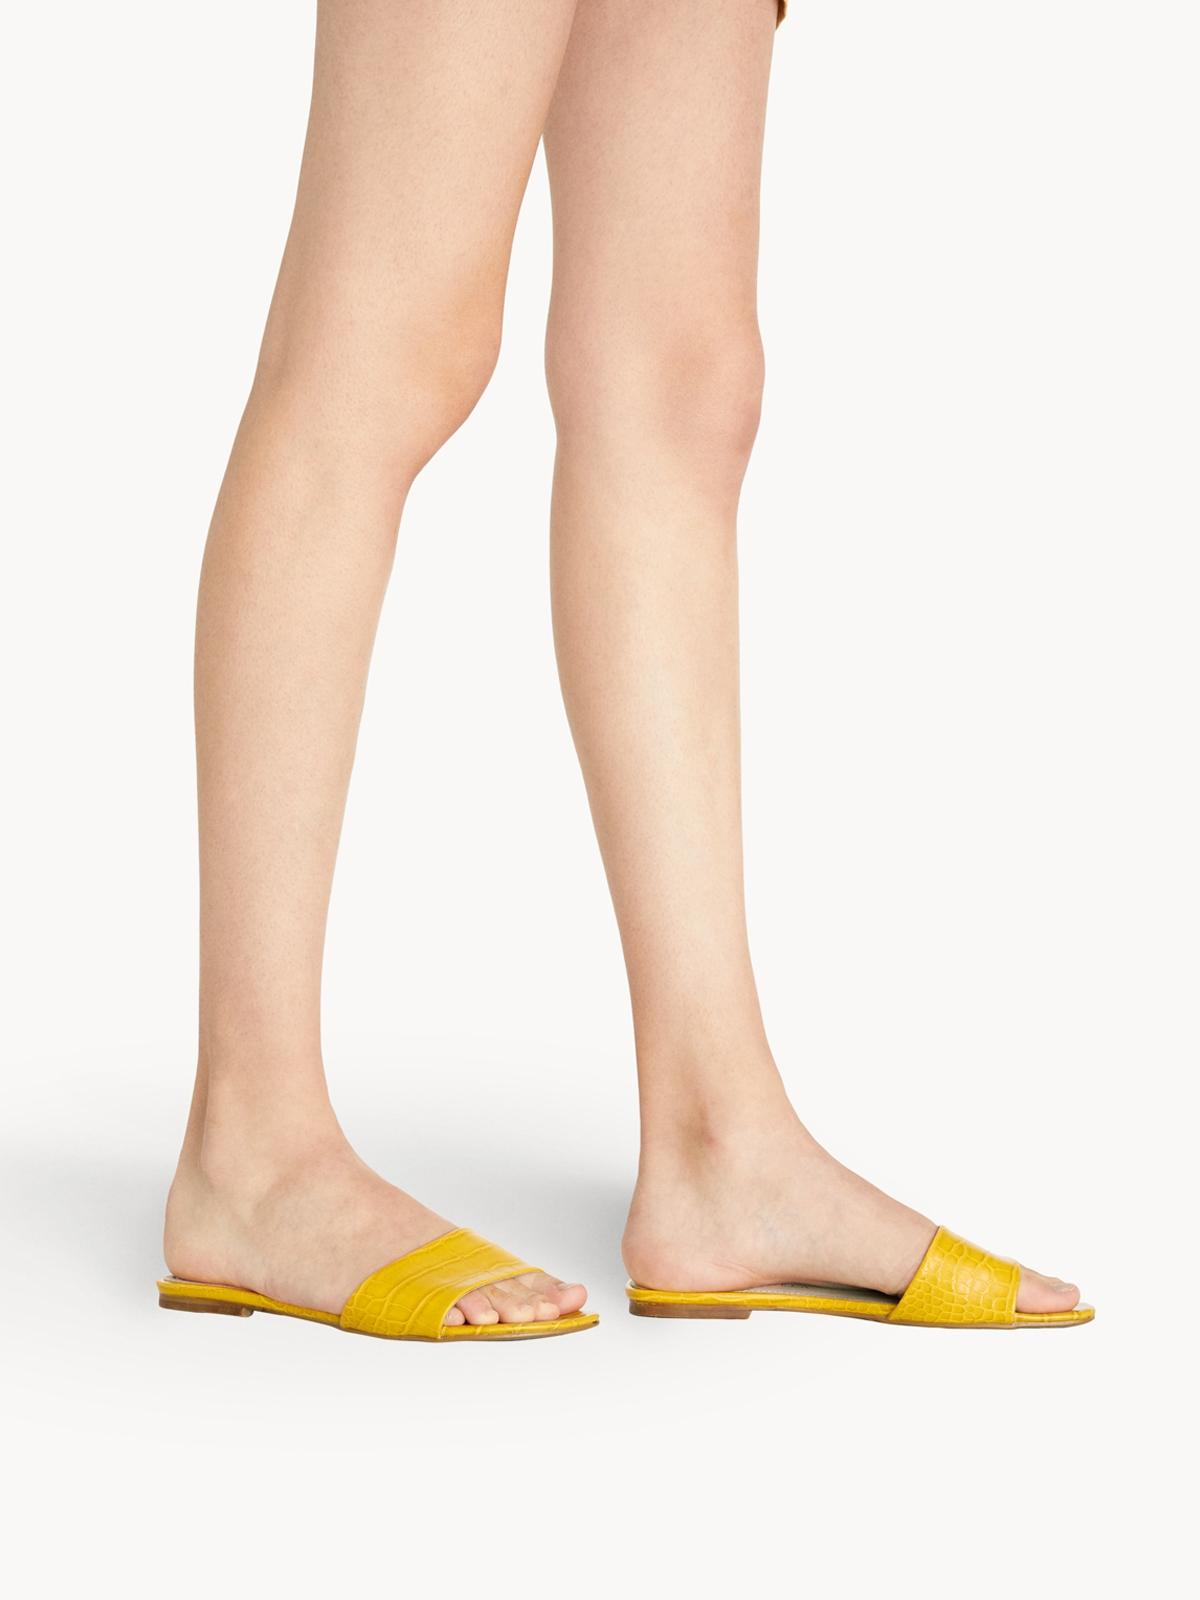 Starkela Flat Sandals Yellow